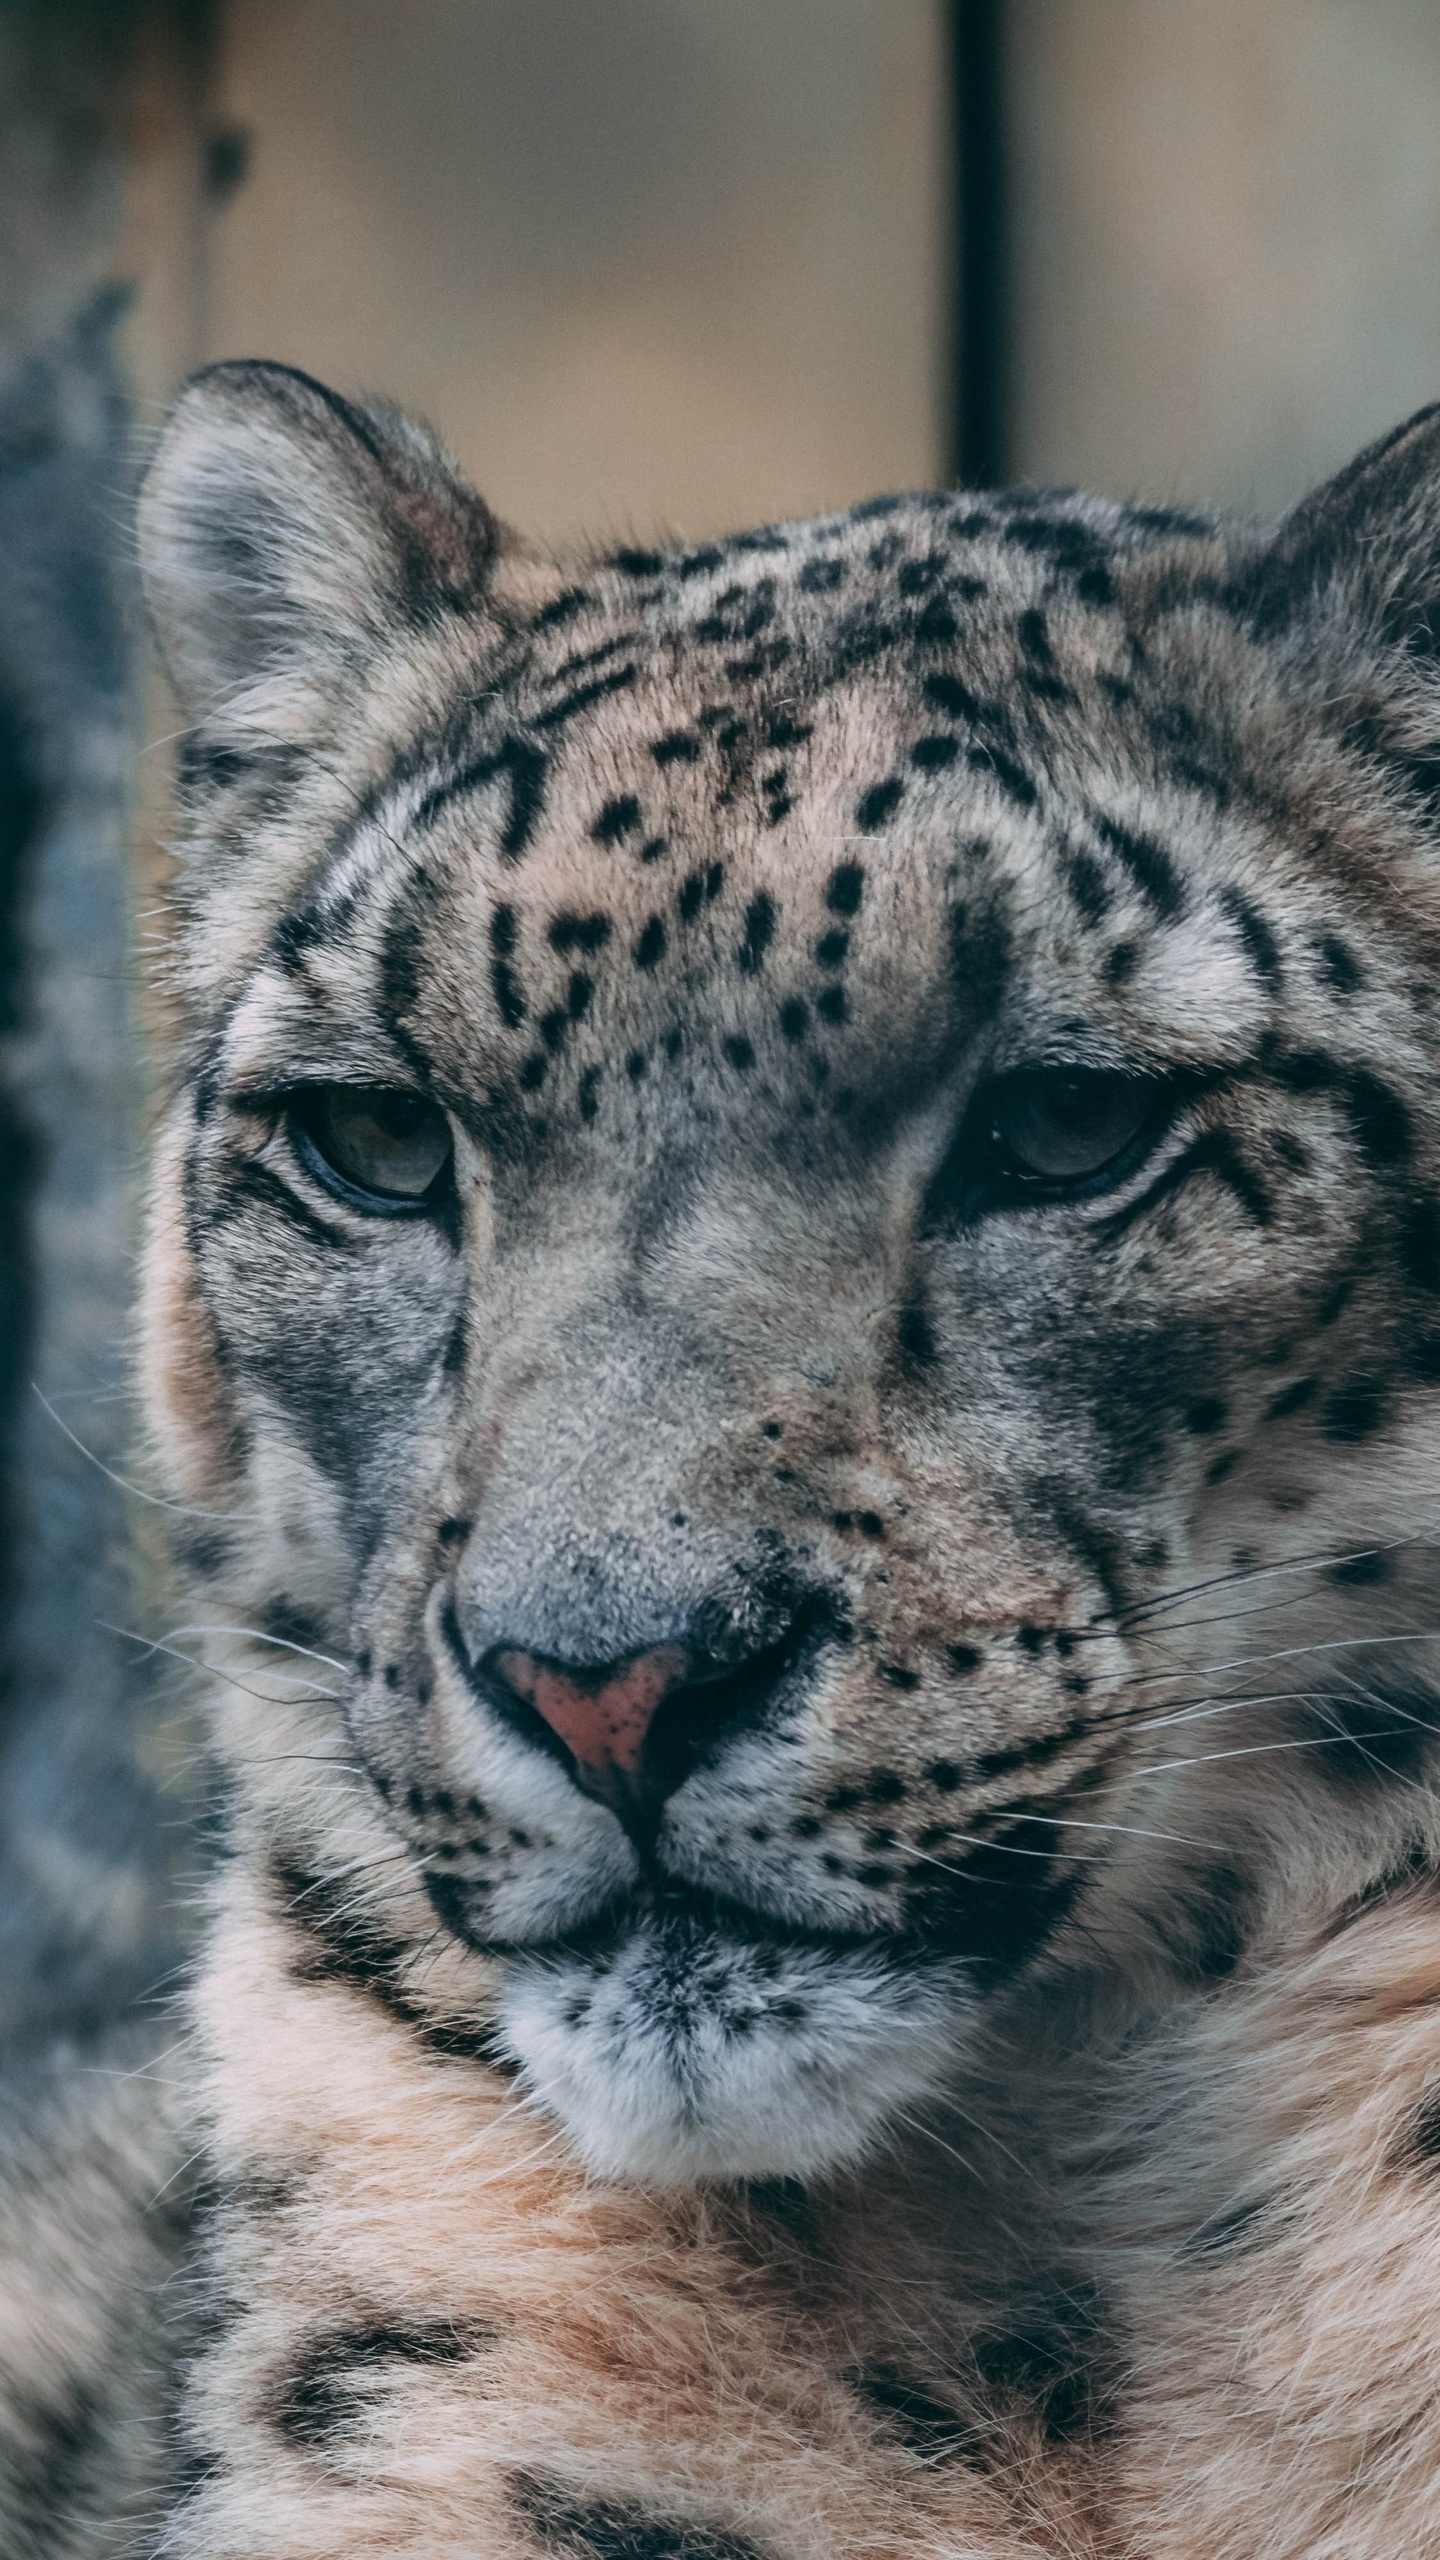 tiger-starring-5k-oq.jpg